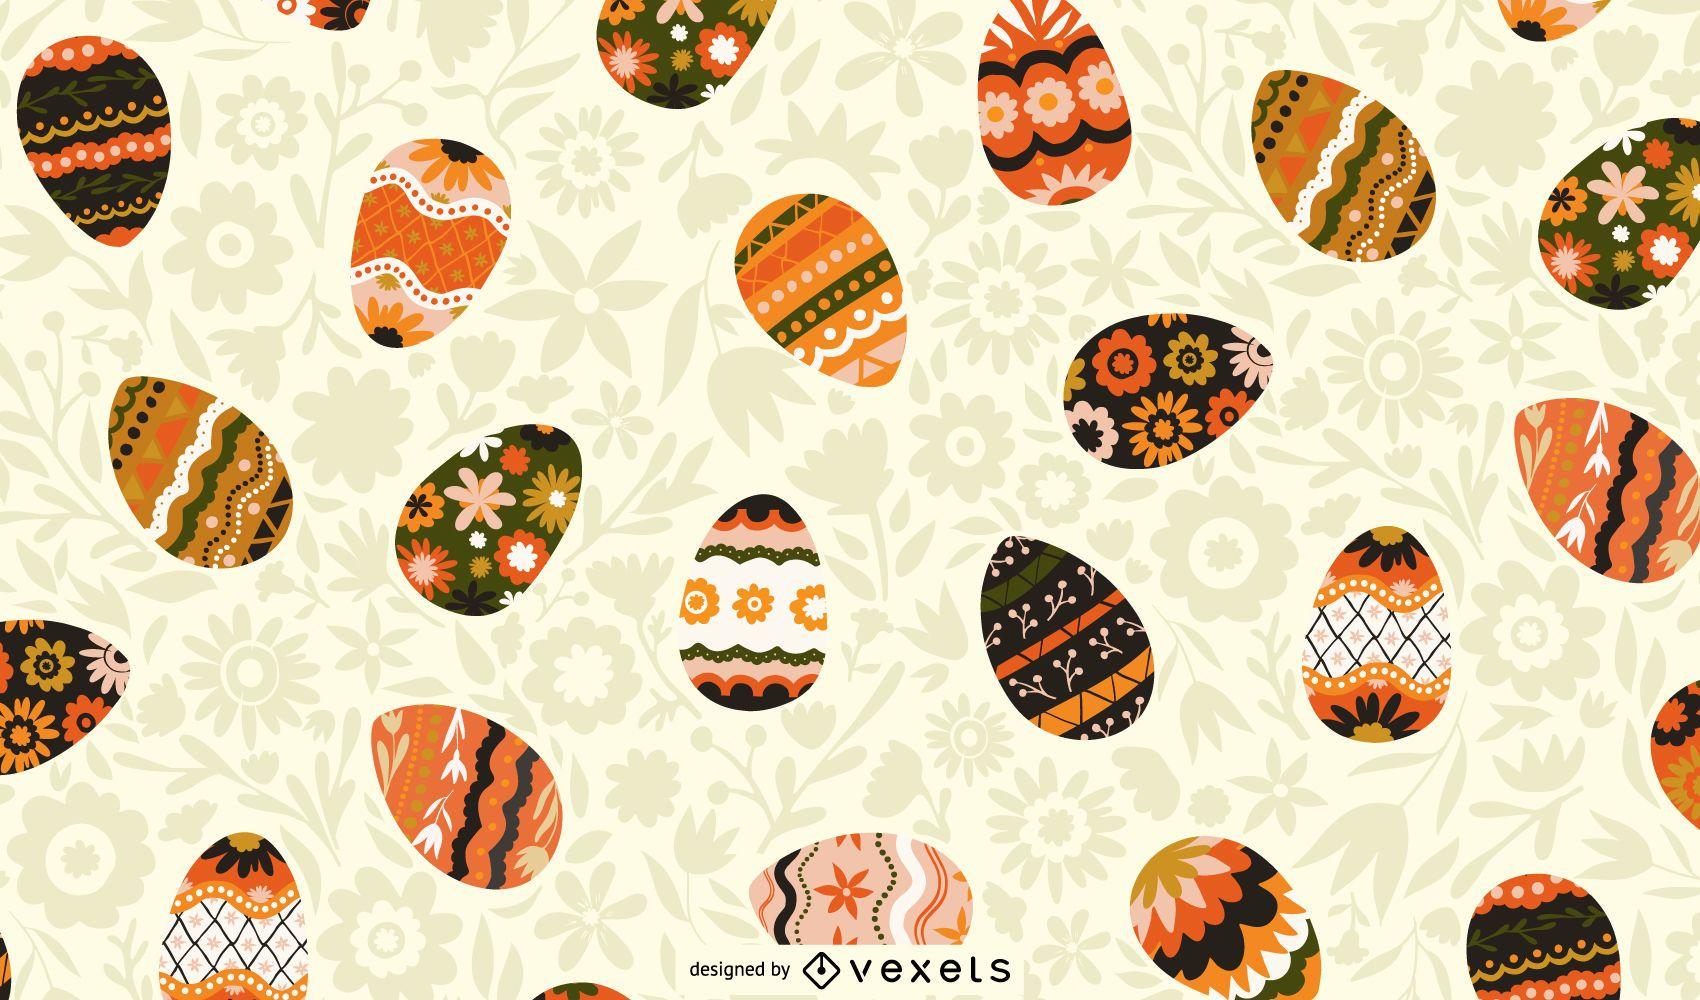 Diseño de patrón de huevos de Pascua